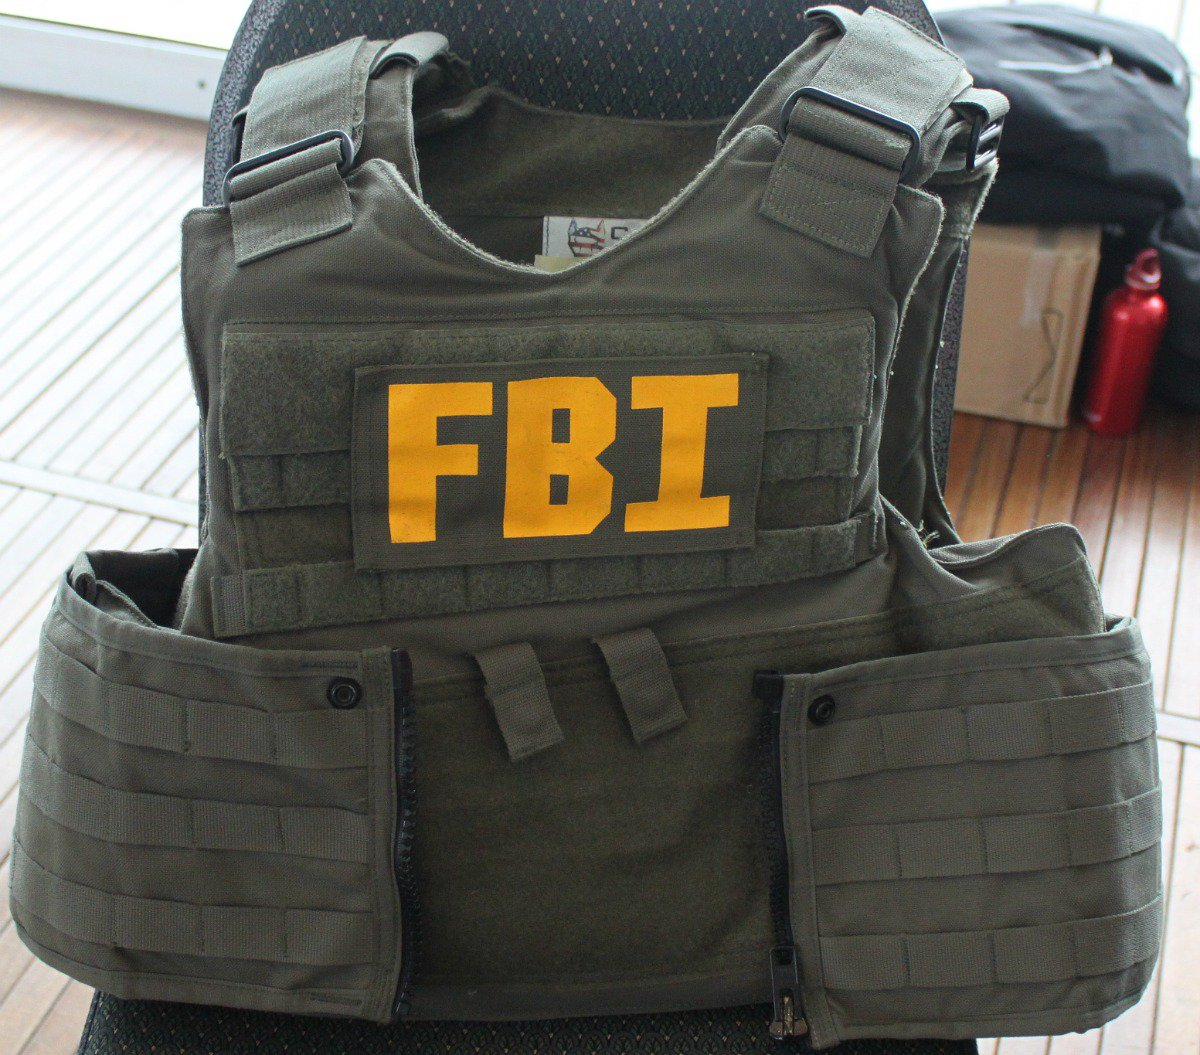 "News24/680 On Twitter: ""#FBI Body Armor And Ammo Stolen"